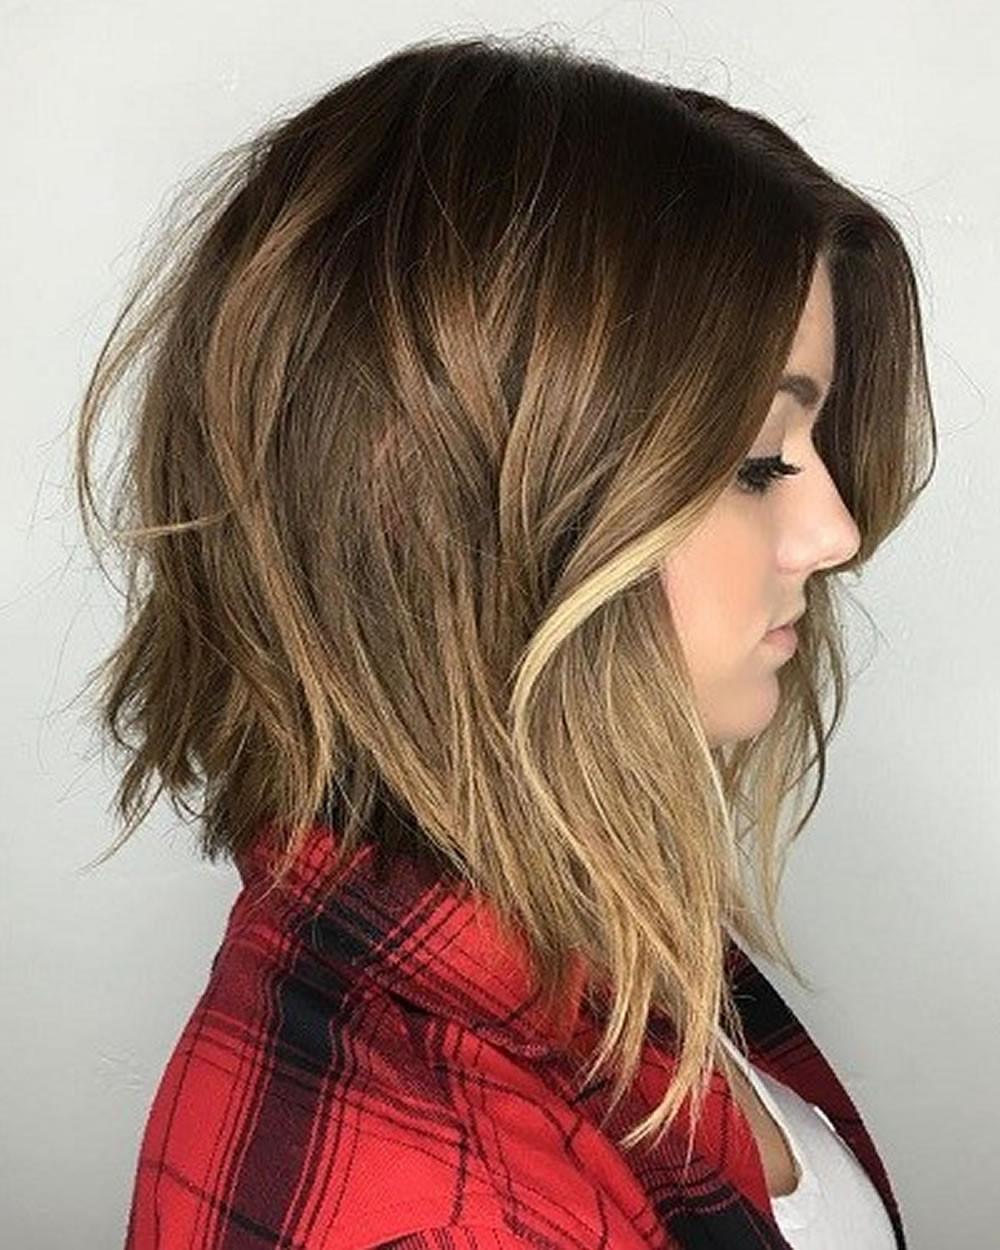 Shaggy Bob Haircuts 2019  20 Latest Mixed 2018 Short Haircuts for Women Bob Pixie